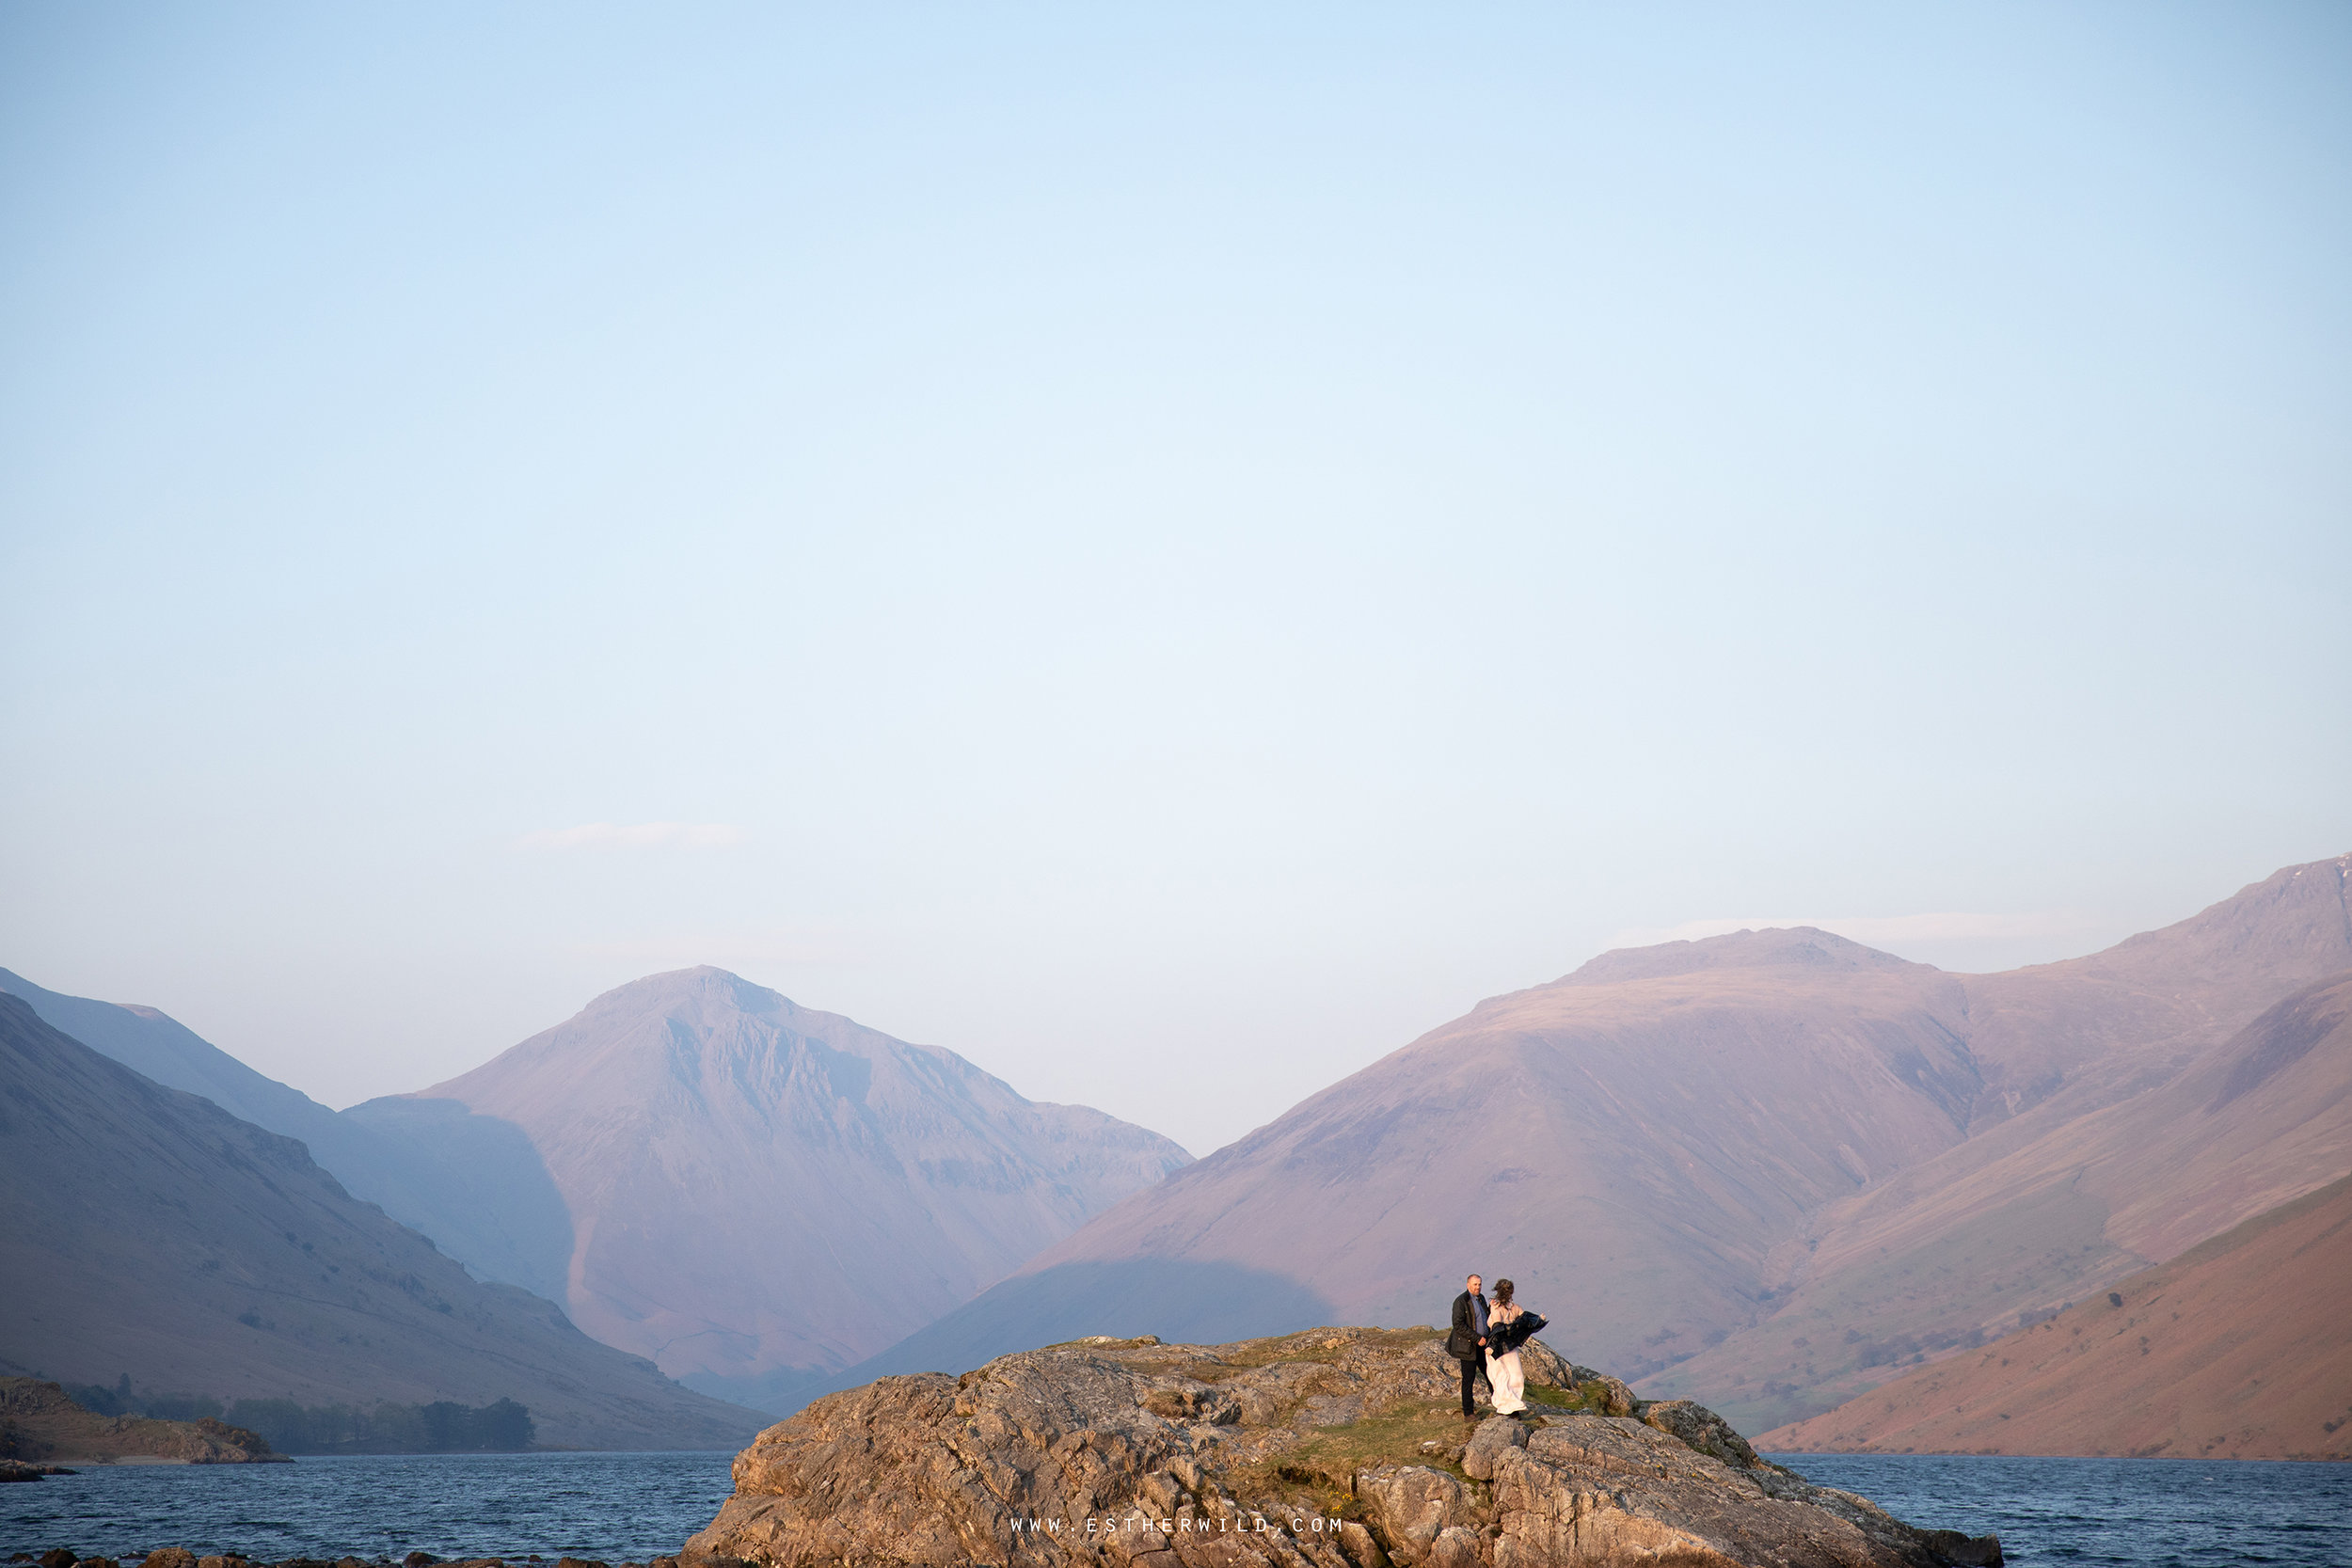 Cumbria_Lake_District_Wasdale_Wedding_Photographer_Destination_Engagement_Anniversary_Esther_Wild_IMG_4597.jpg